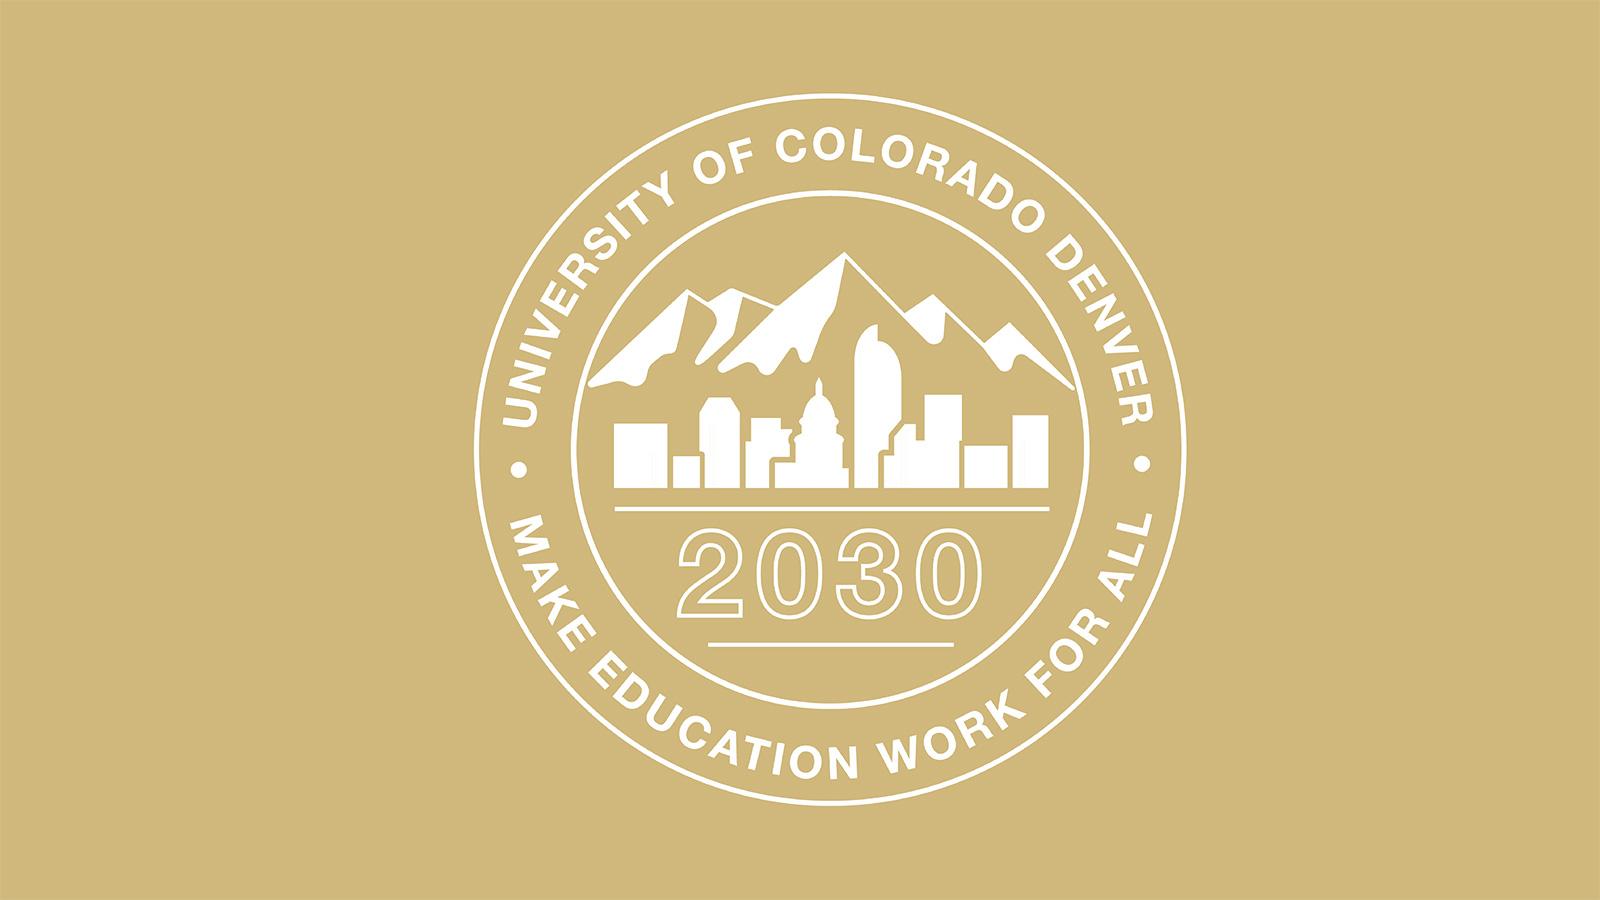 Seal of University of Colorado Denver, 2030 - Make Education Work for All